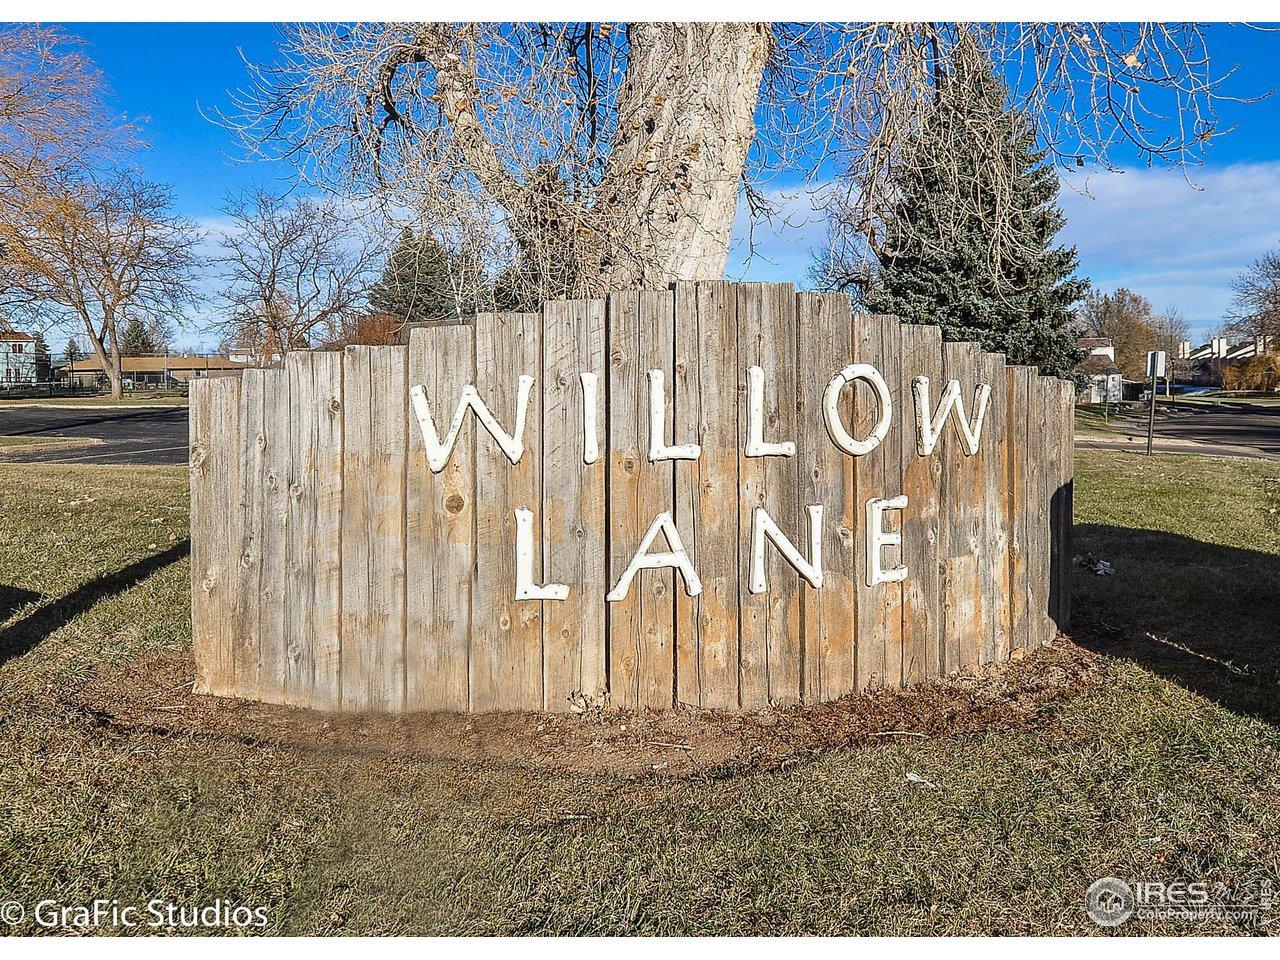 Located in Willow Lane subdivision